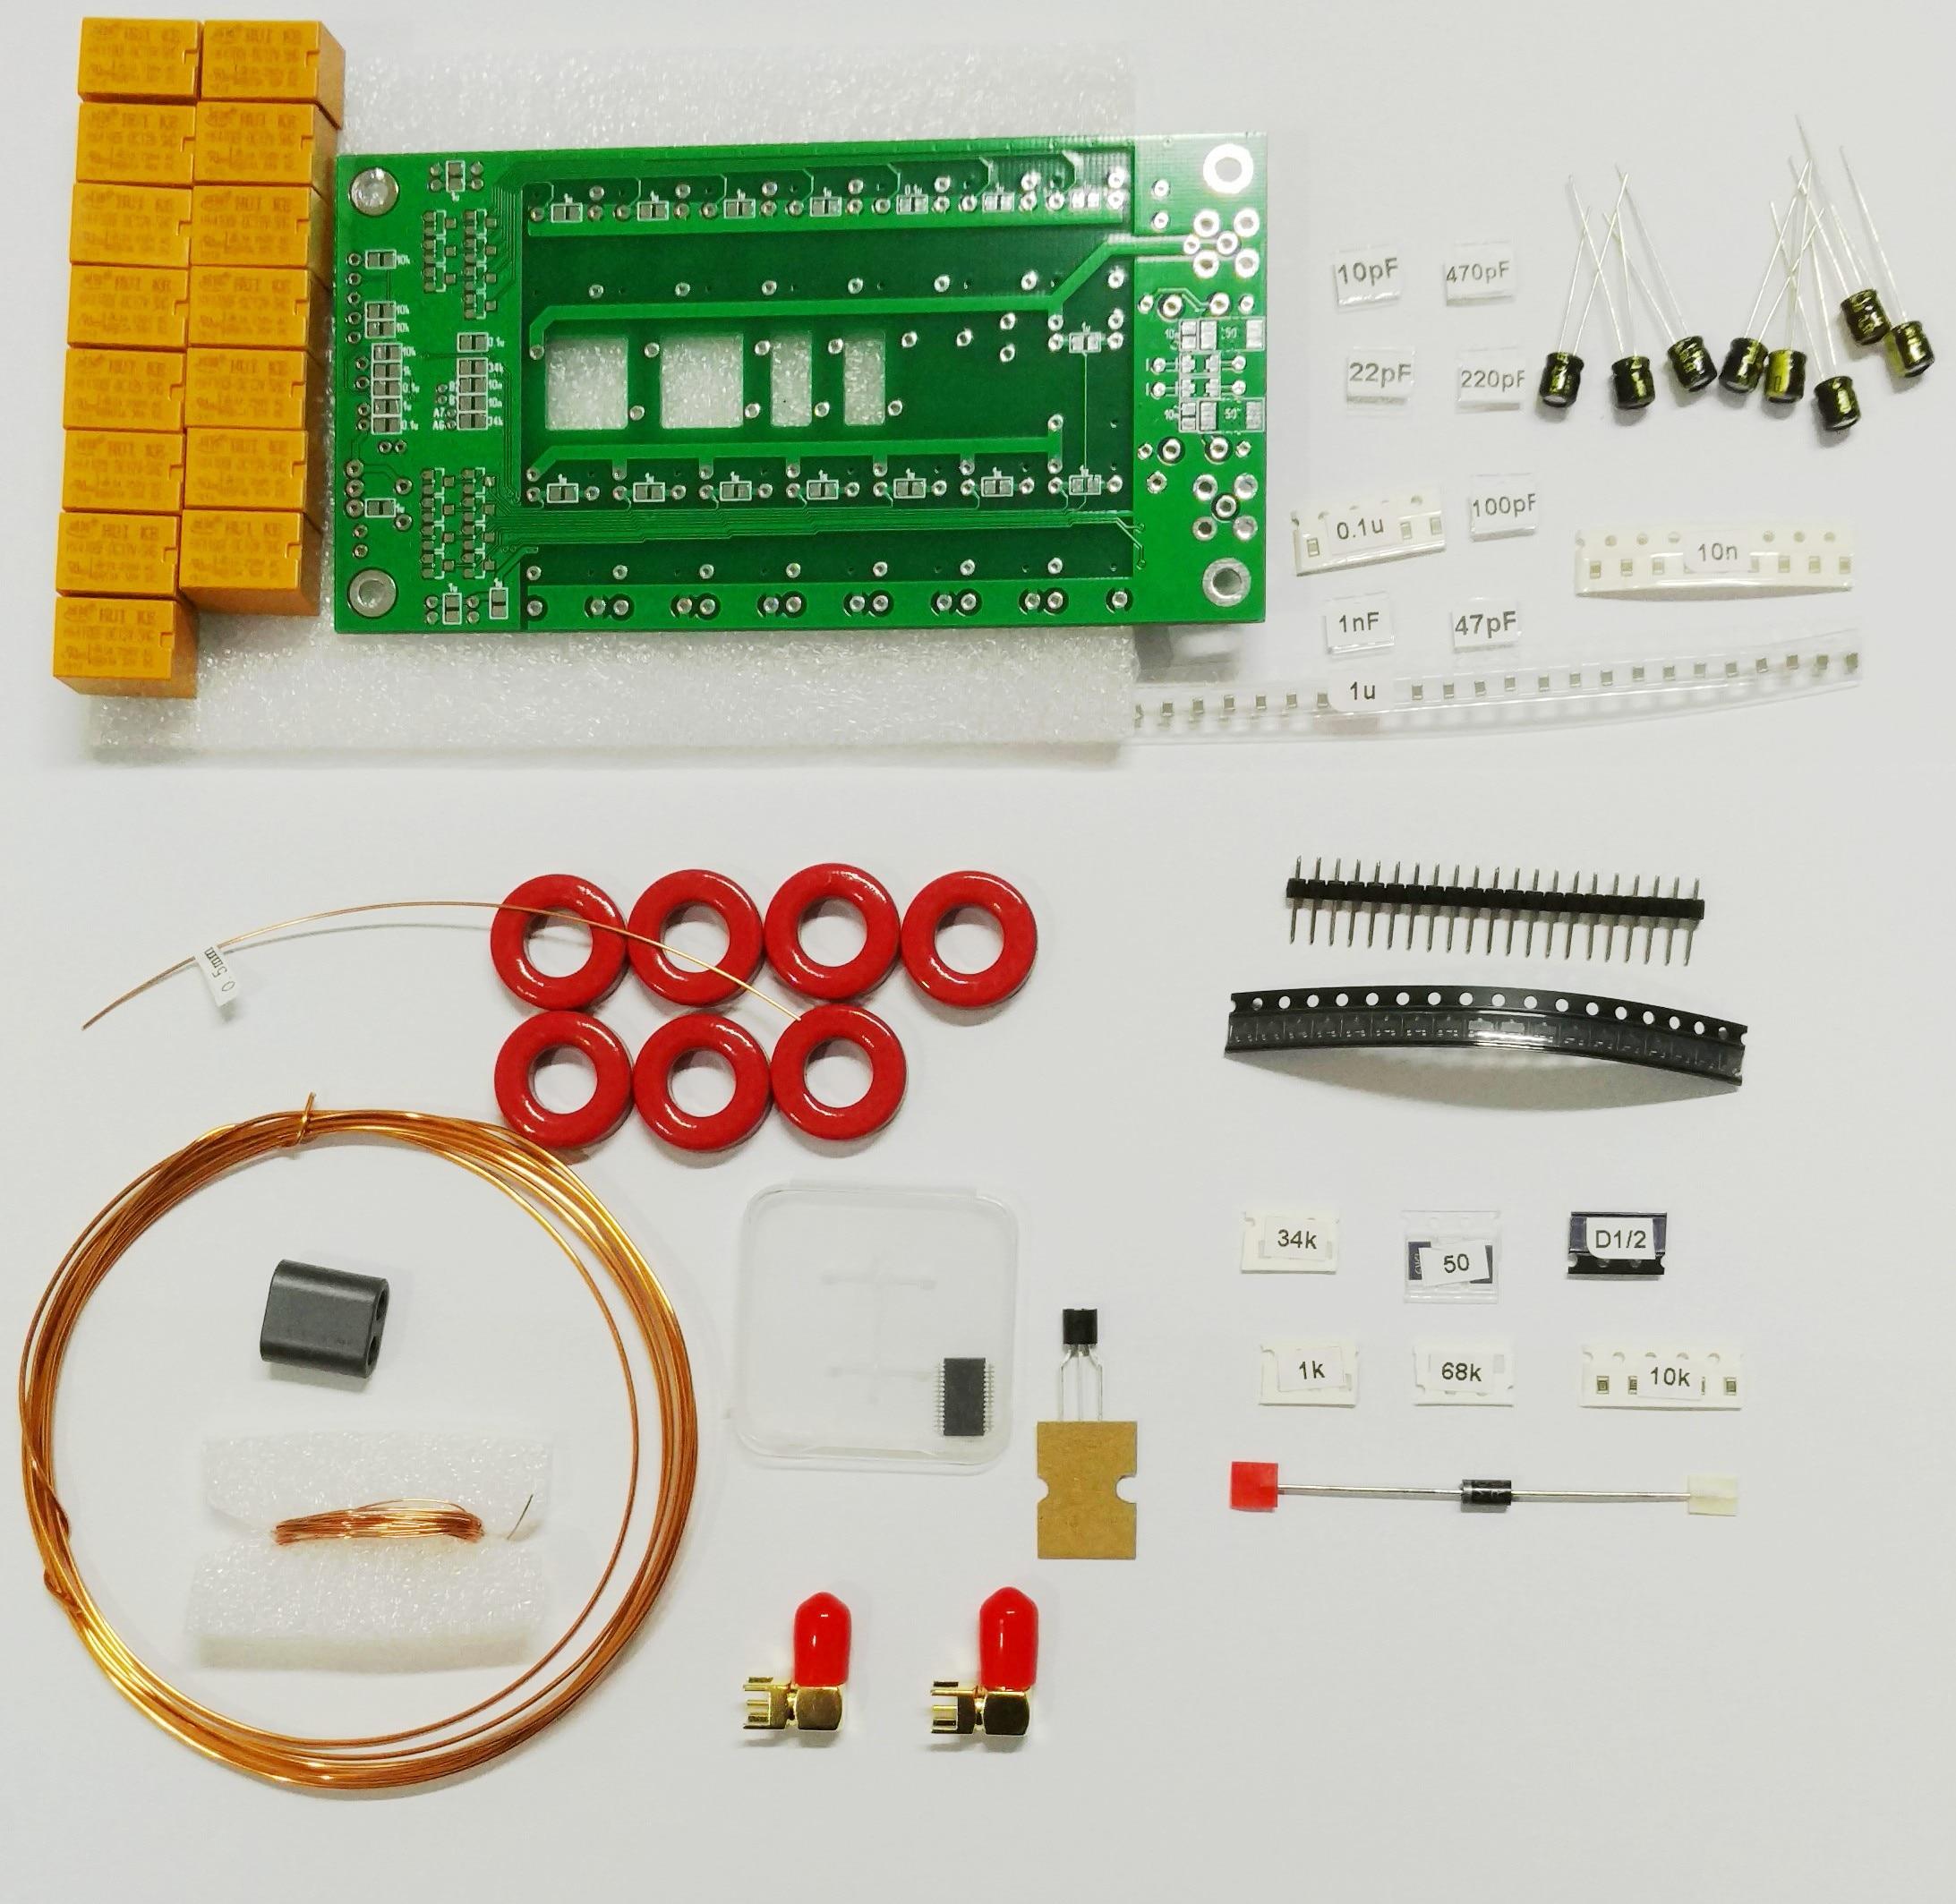 Latest version , Free shipping DIY Kits 1.8-50MHz ATU-100mini Automatic Antenna Tuner by N7DDC 7x7